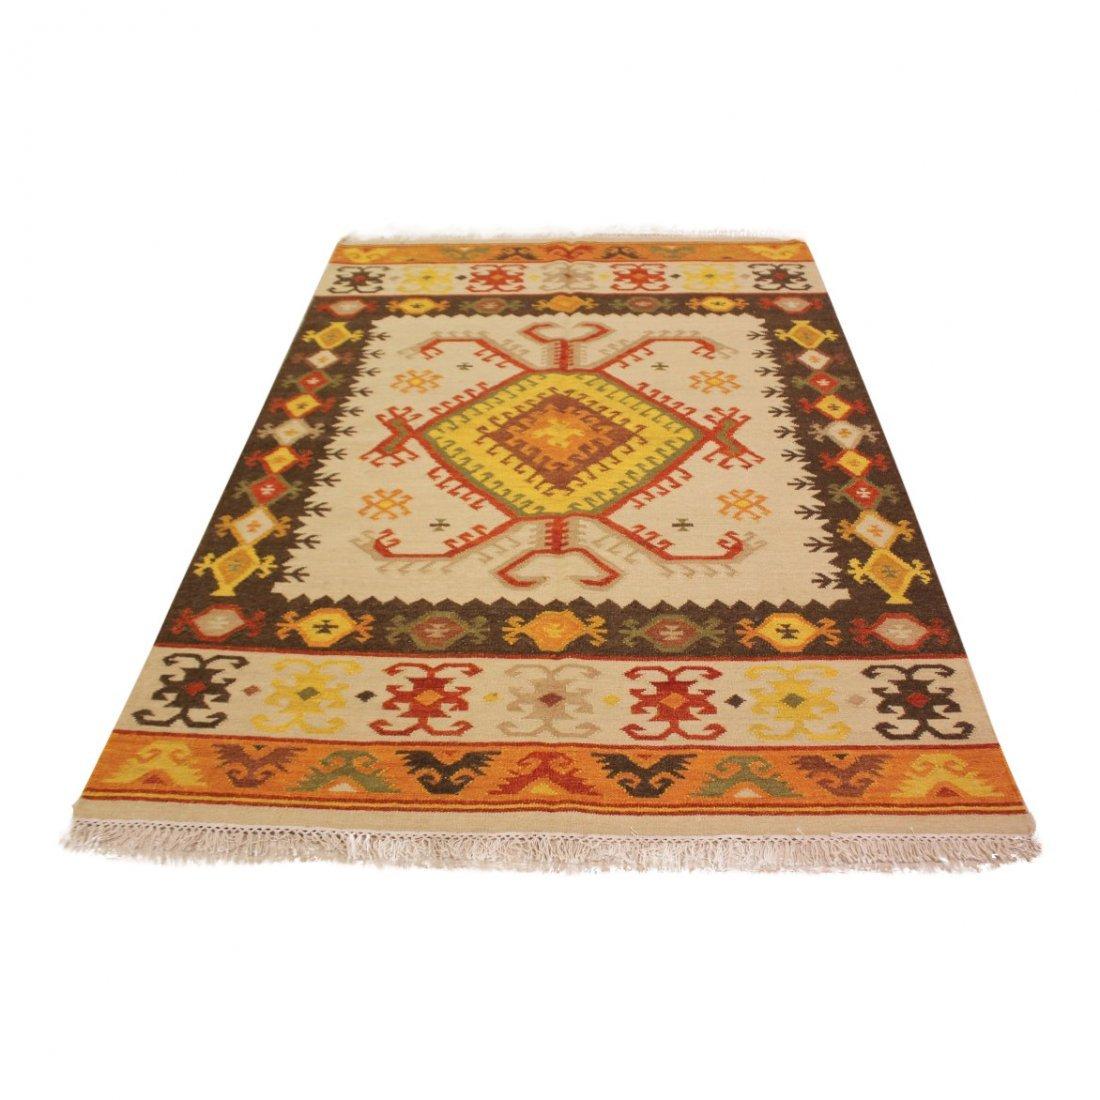 Tribal Handmade Flatweave Kilim Area Rug 5.3x7.7